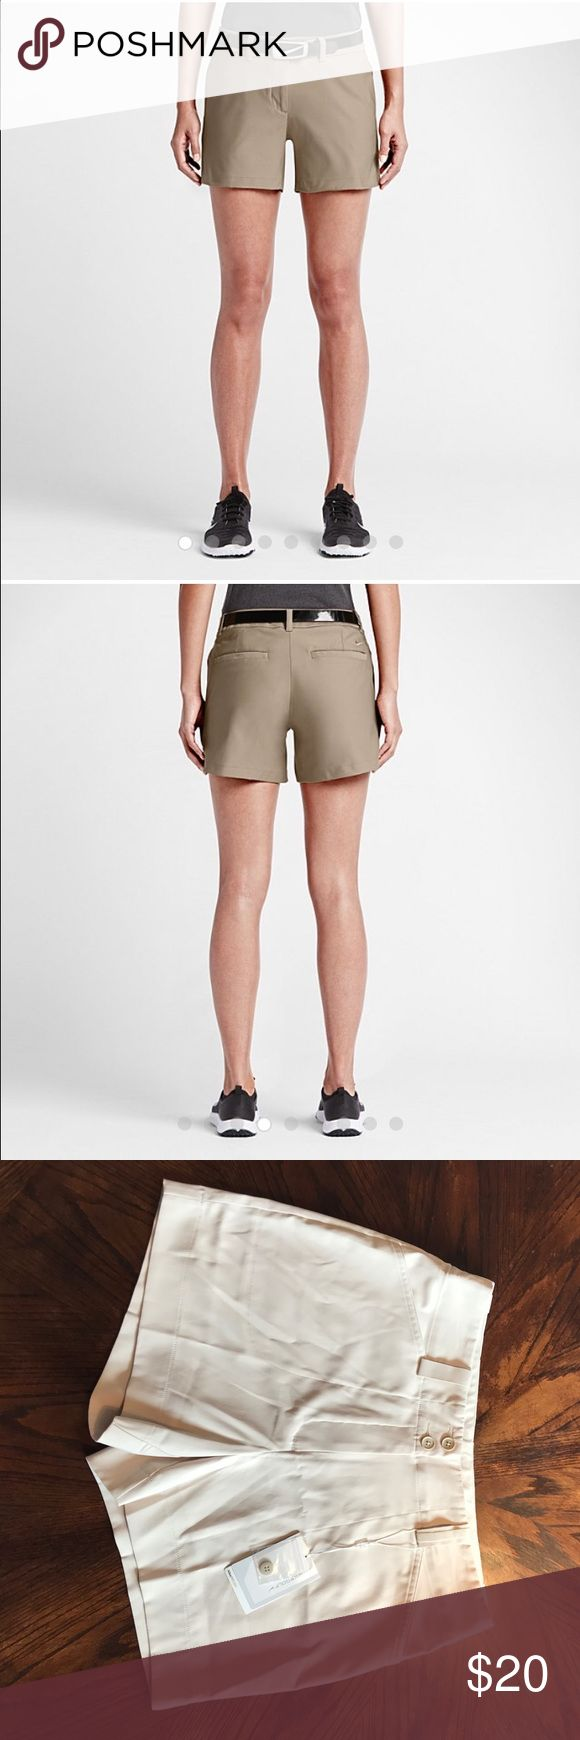 "Nike women's gold shorts NWT size 8 NWT! Nike Dry-fit golf shorts ""tournament"" style.  Flat front, light khaki color size 8 :) Nike Shorts"